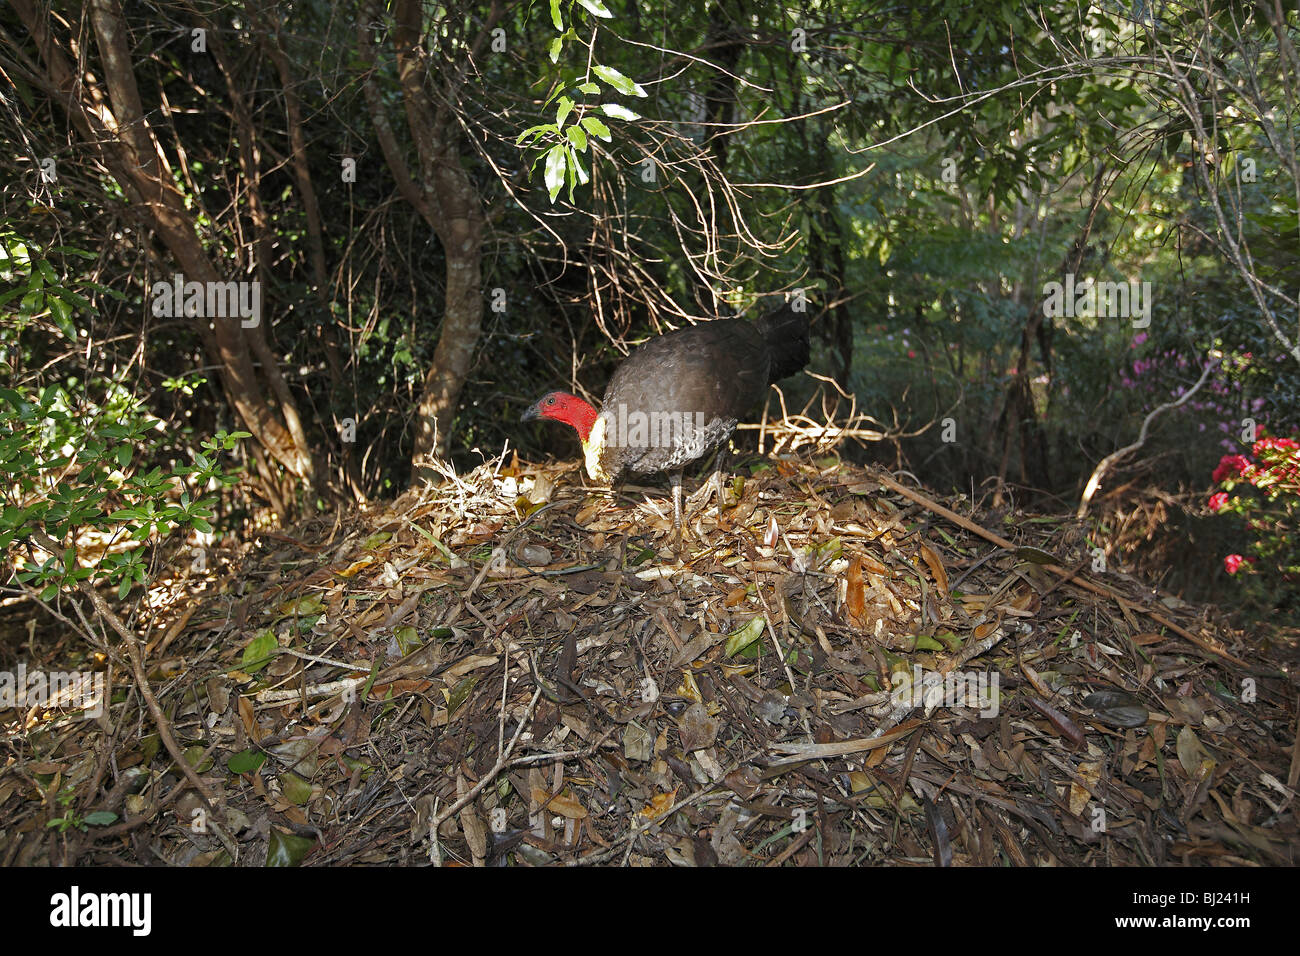 Australische Pinsel-Türkei (Alectura Lathami) am Nest Hügel. Stockbild